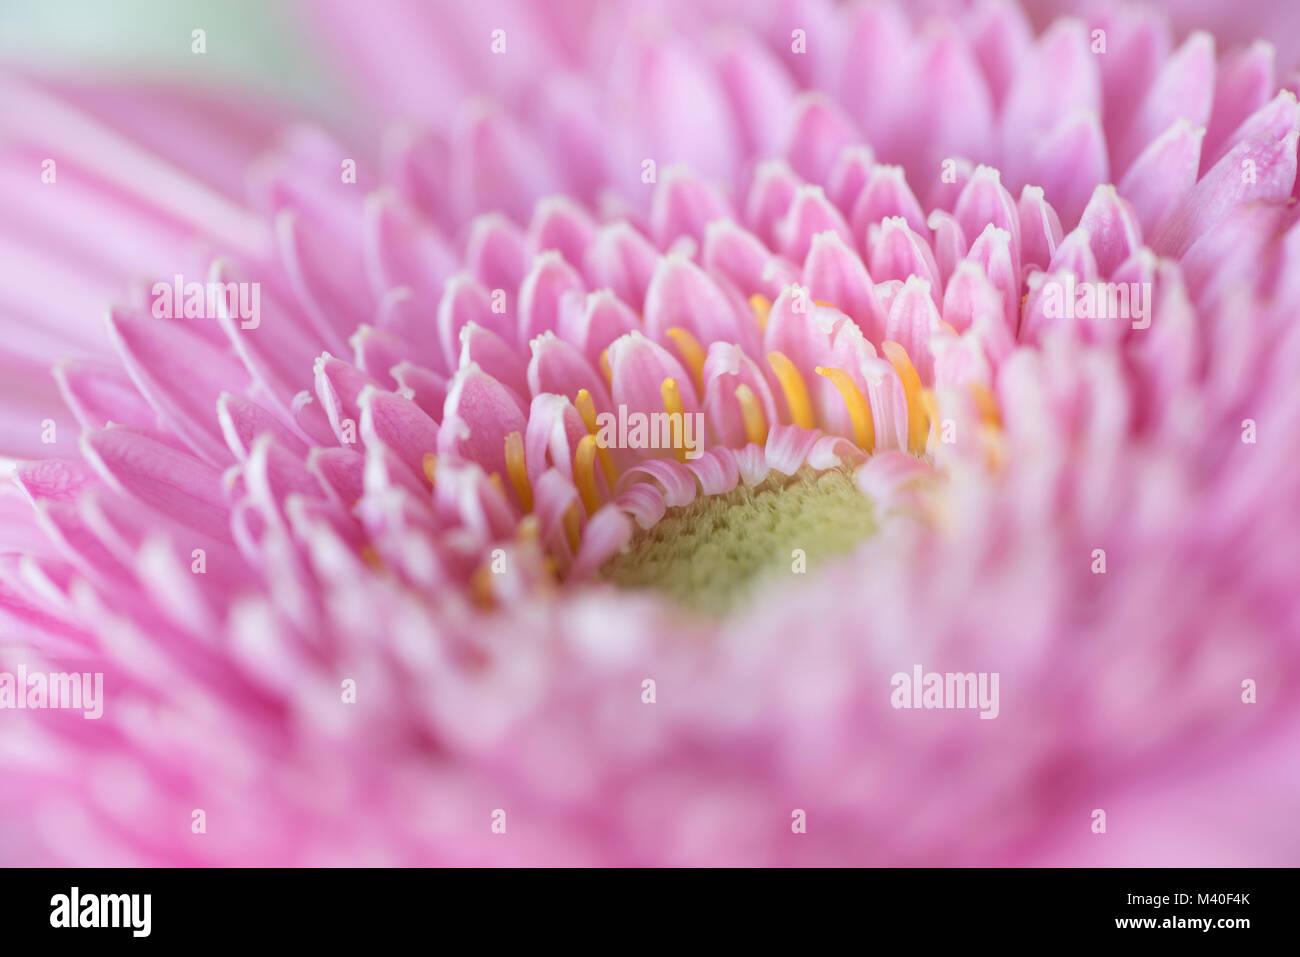 Closeup of center of pink Gerbera Daisy, oblique view - Stock Image